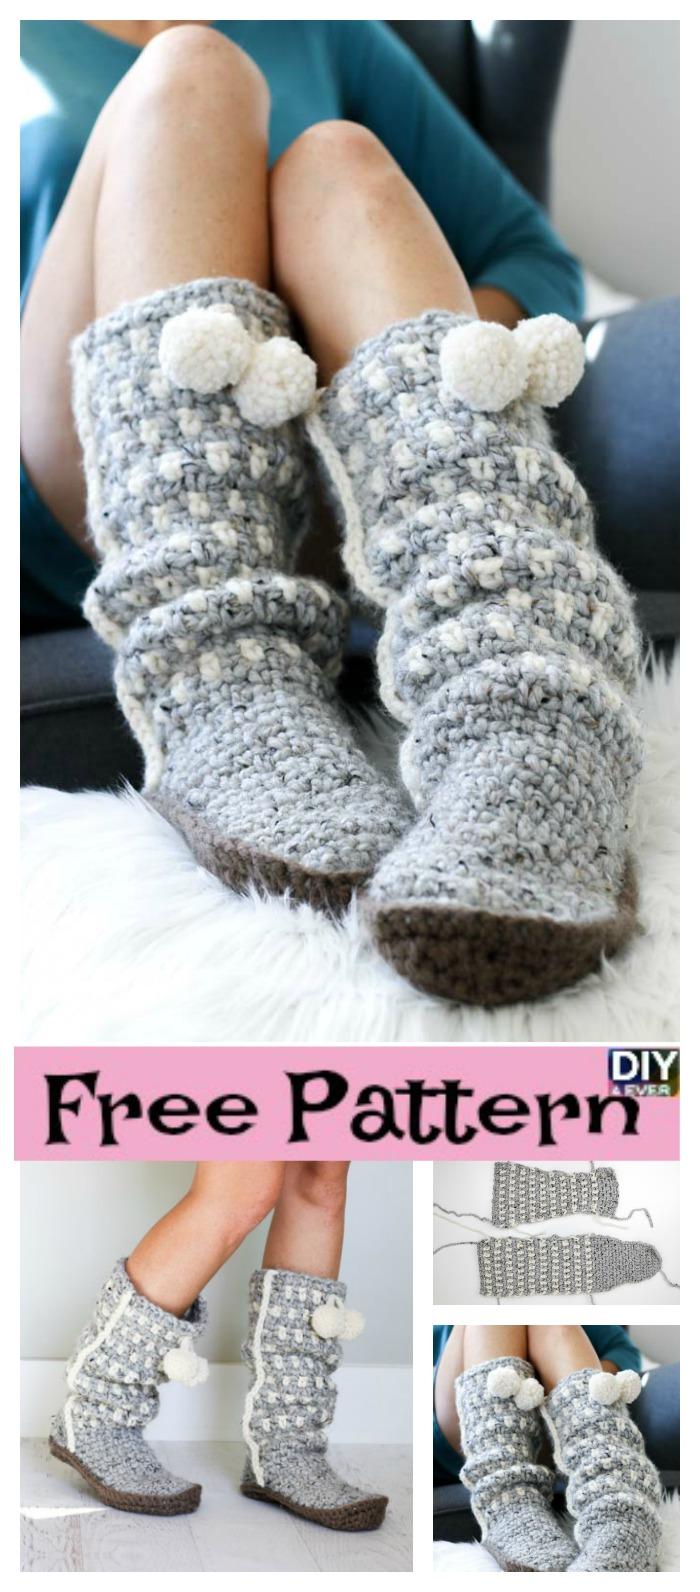 Easy Stylish Crochet Slippers – Free Pattern - DIY 4 EVER